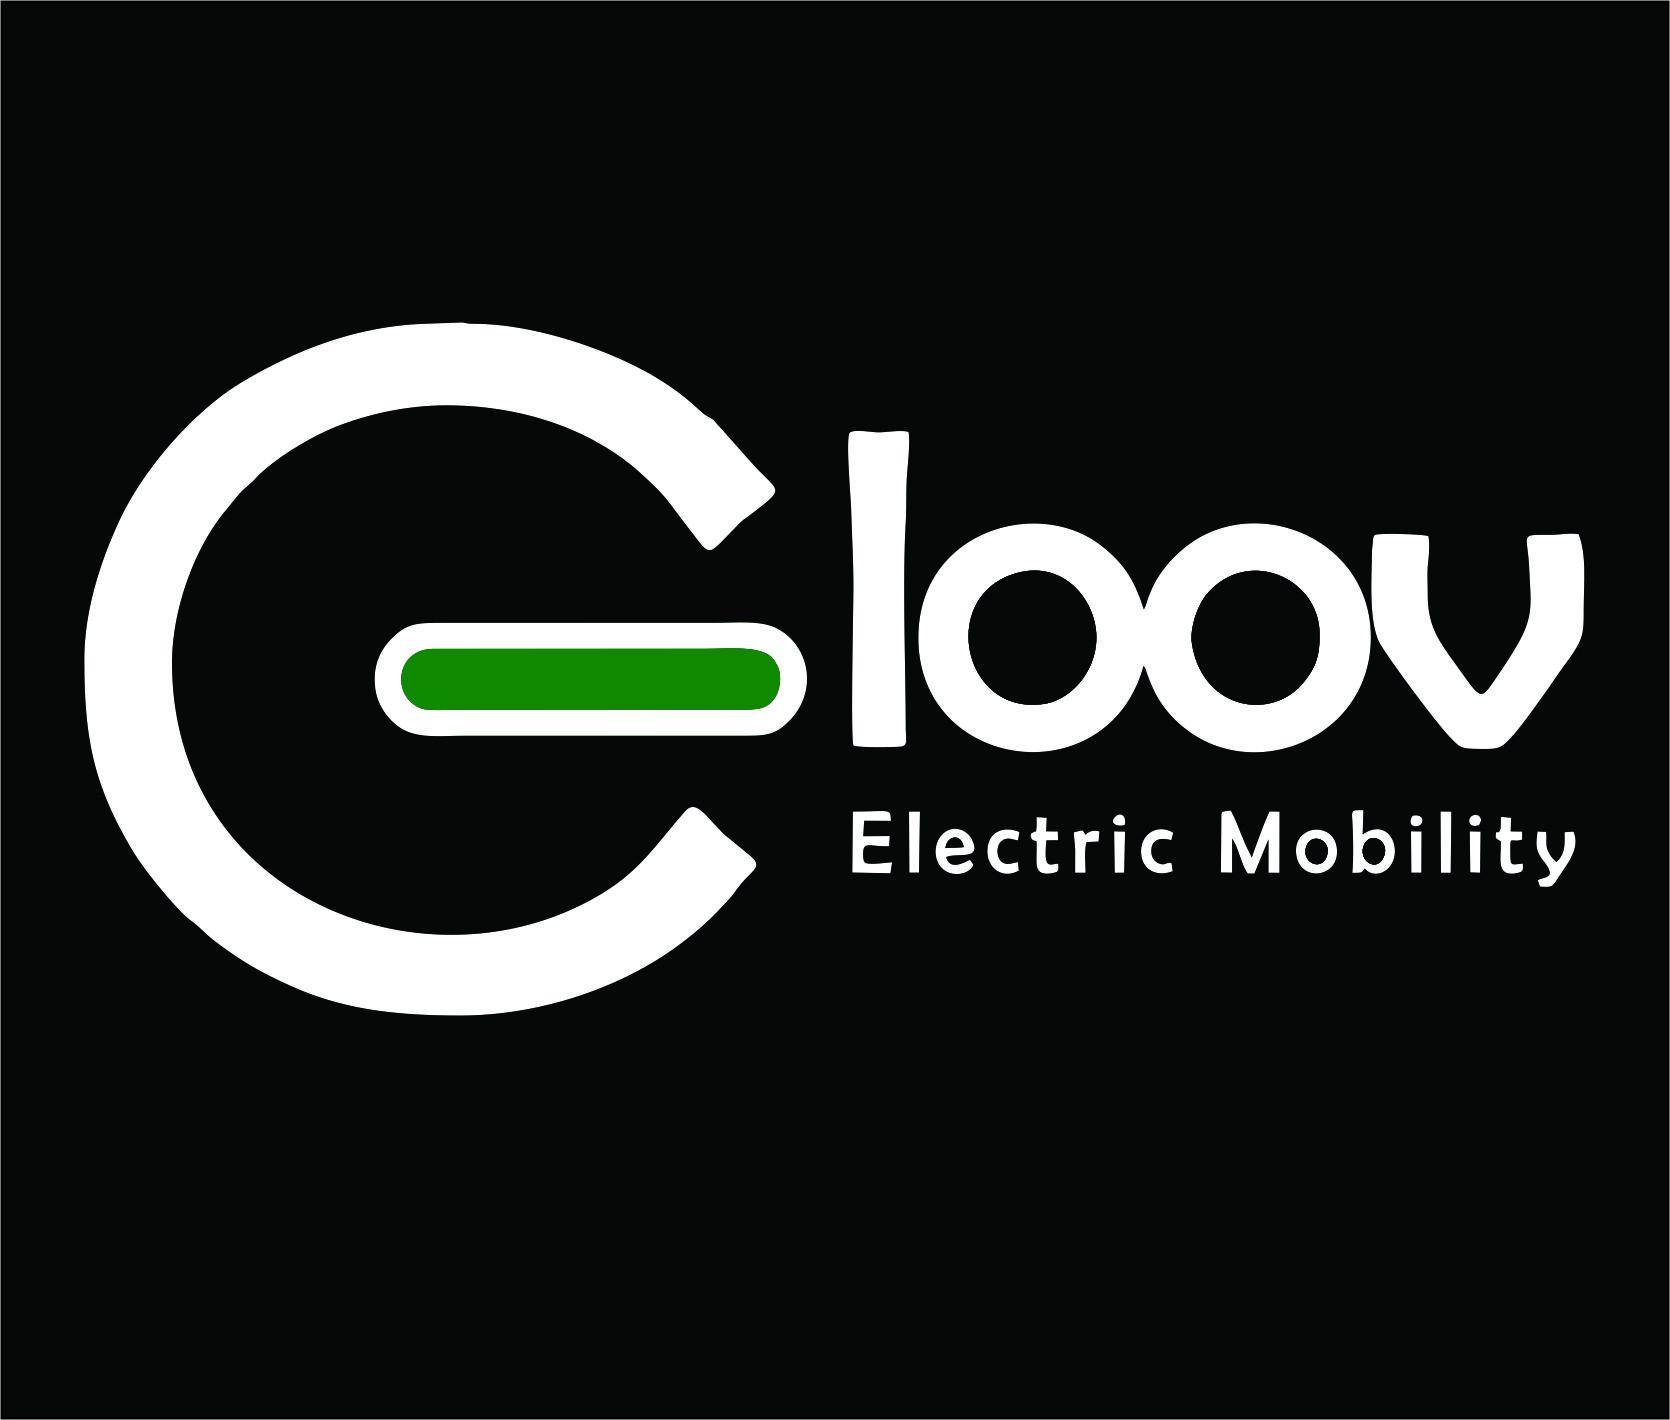 Gloov Electric Mobility em Guarujá